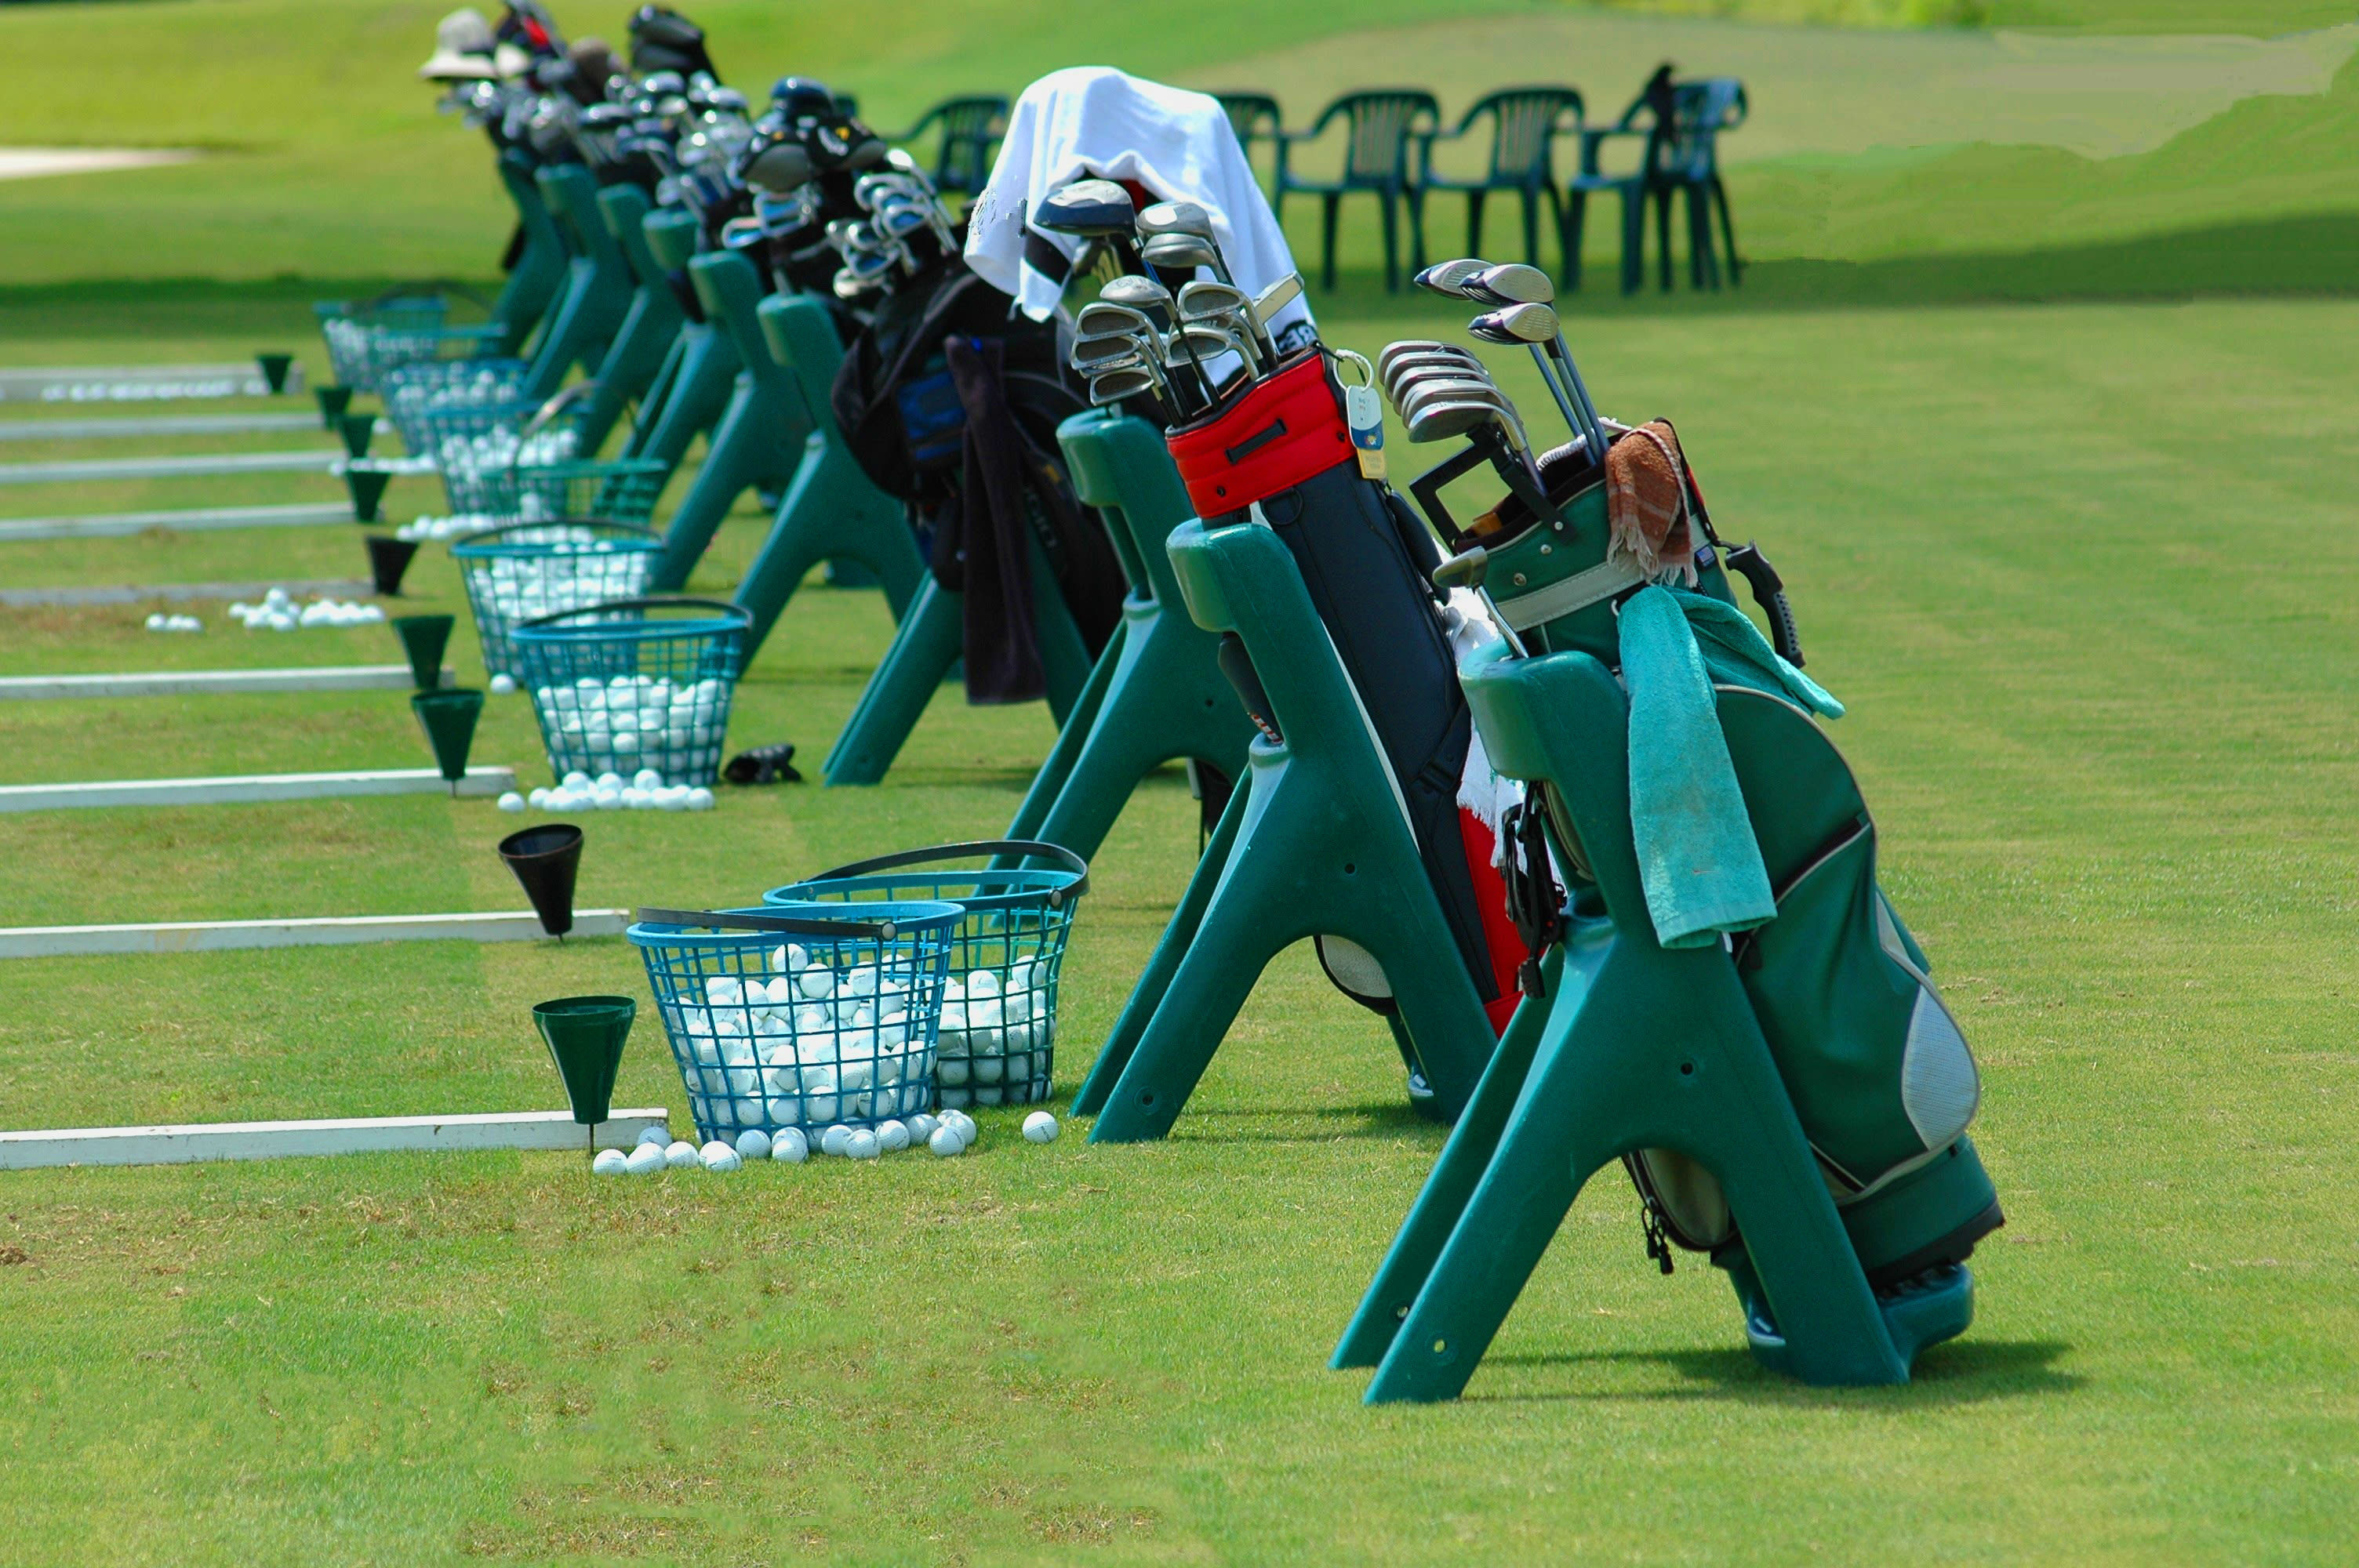 Golf lessons at Hampton